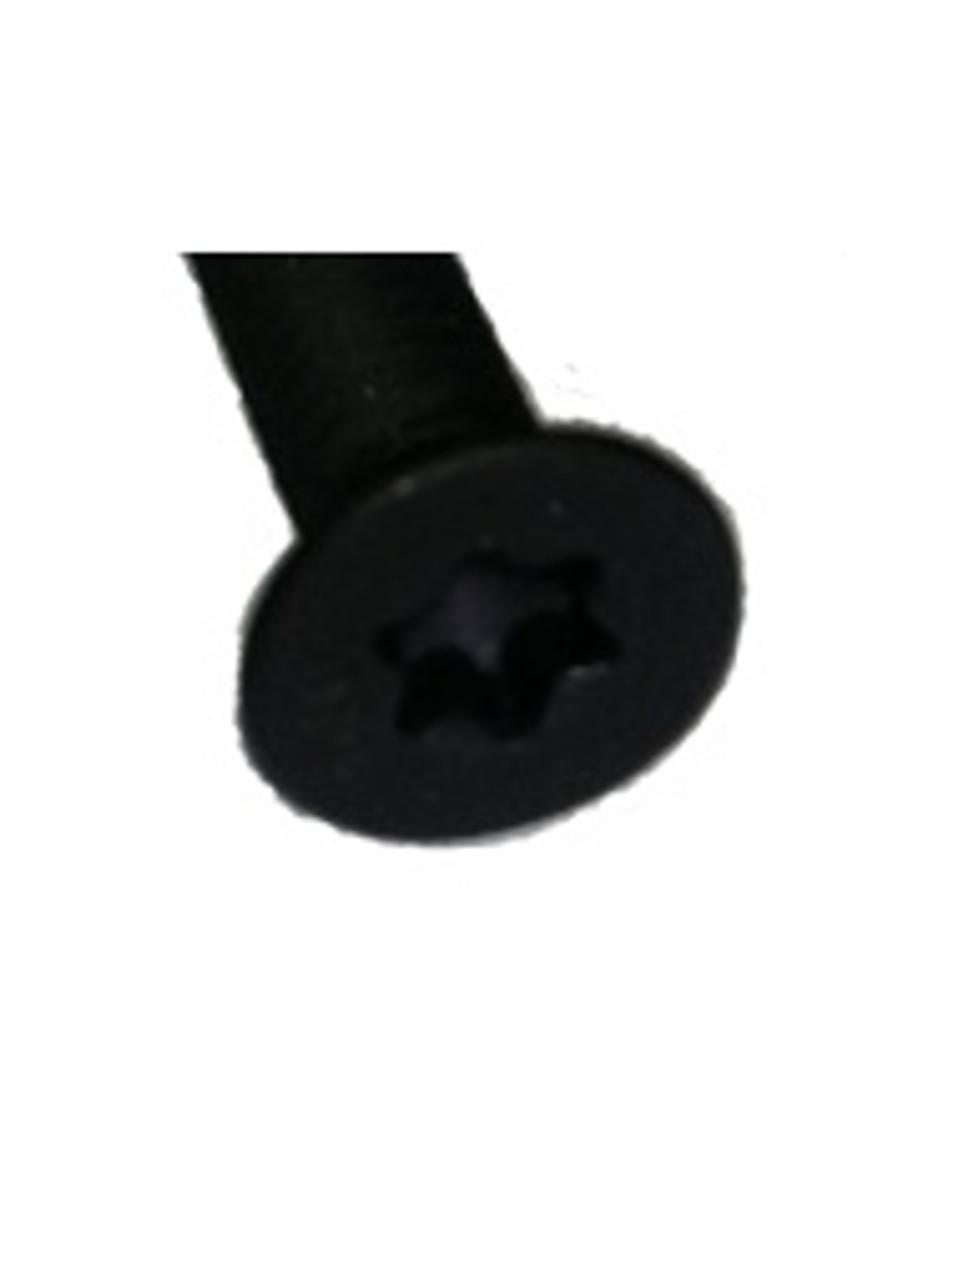 "TFS250 --- Torx Floor Screw 1/4"" - 20 x 2-1/2"""